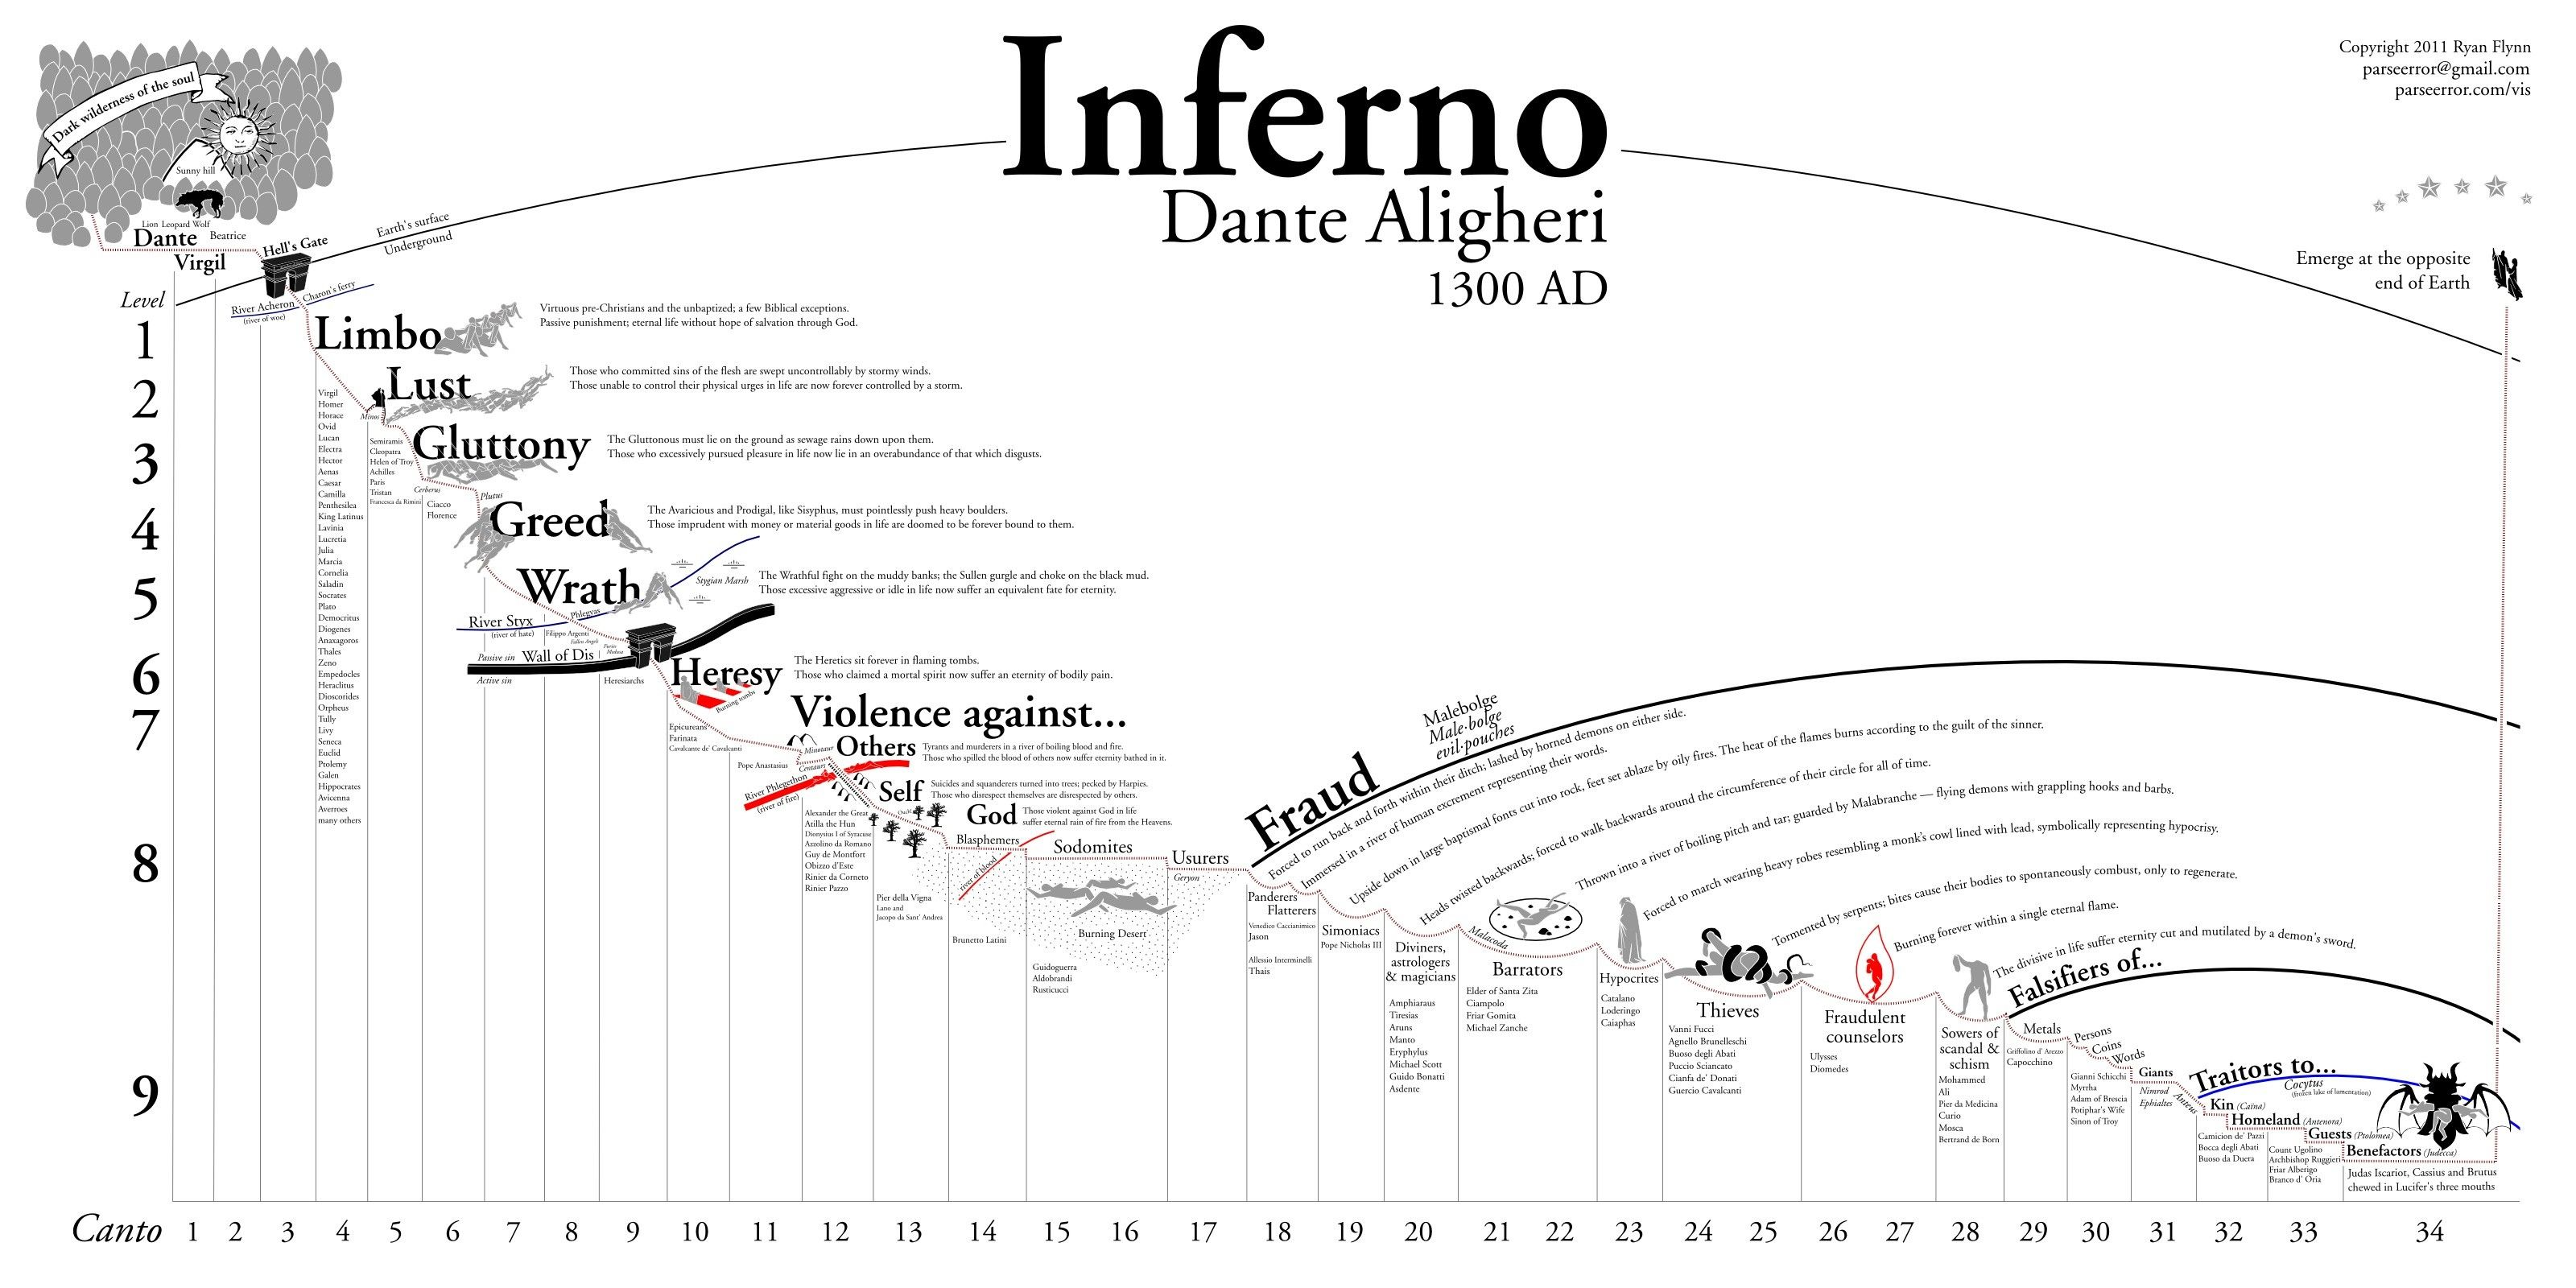 17 Best images about Dante on Pinterest   Circles, Giorgio vasari ...